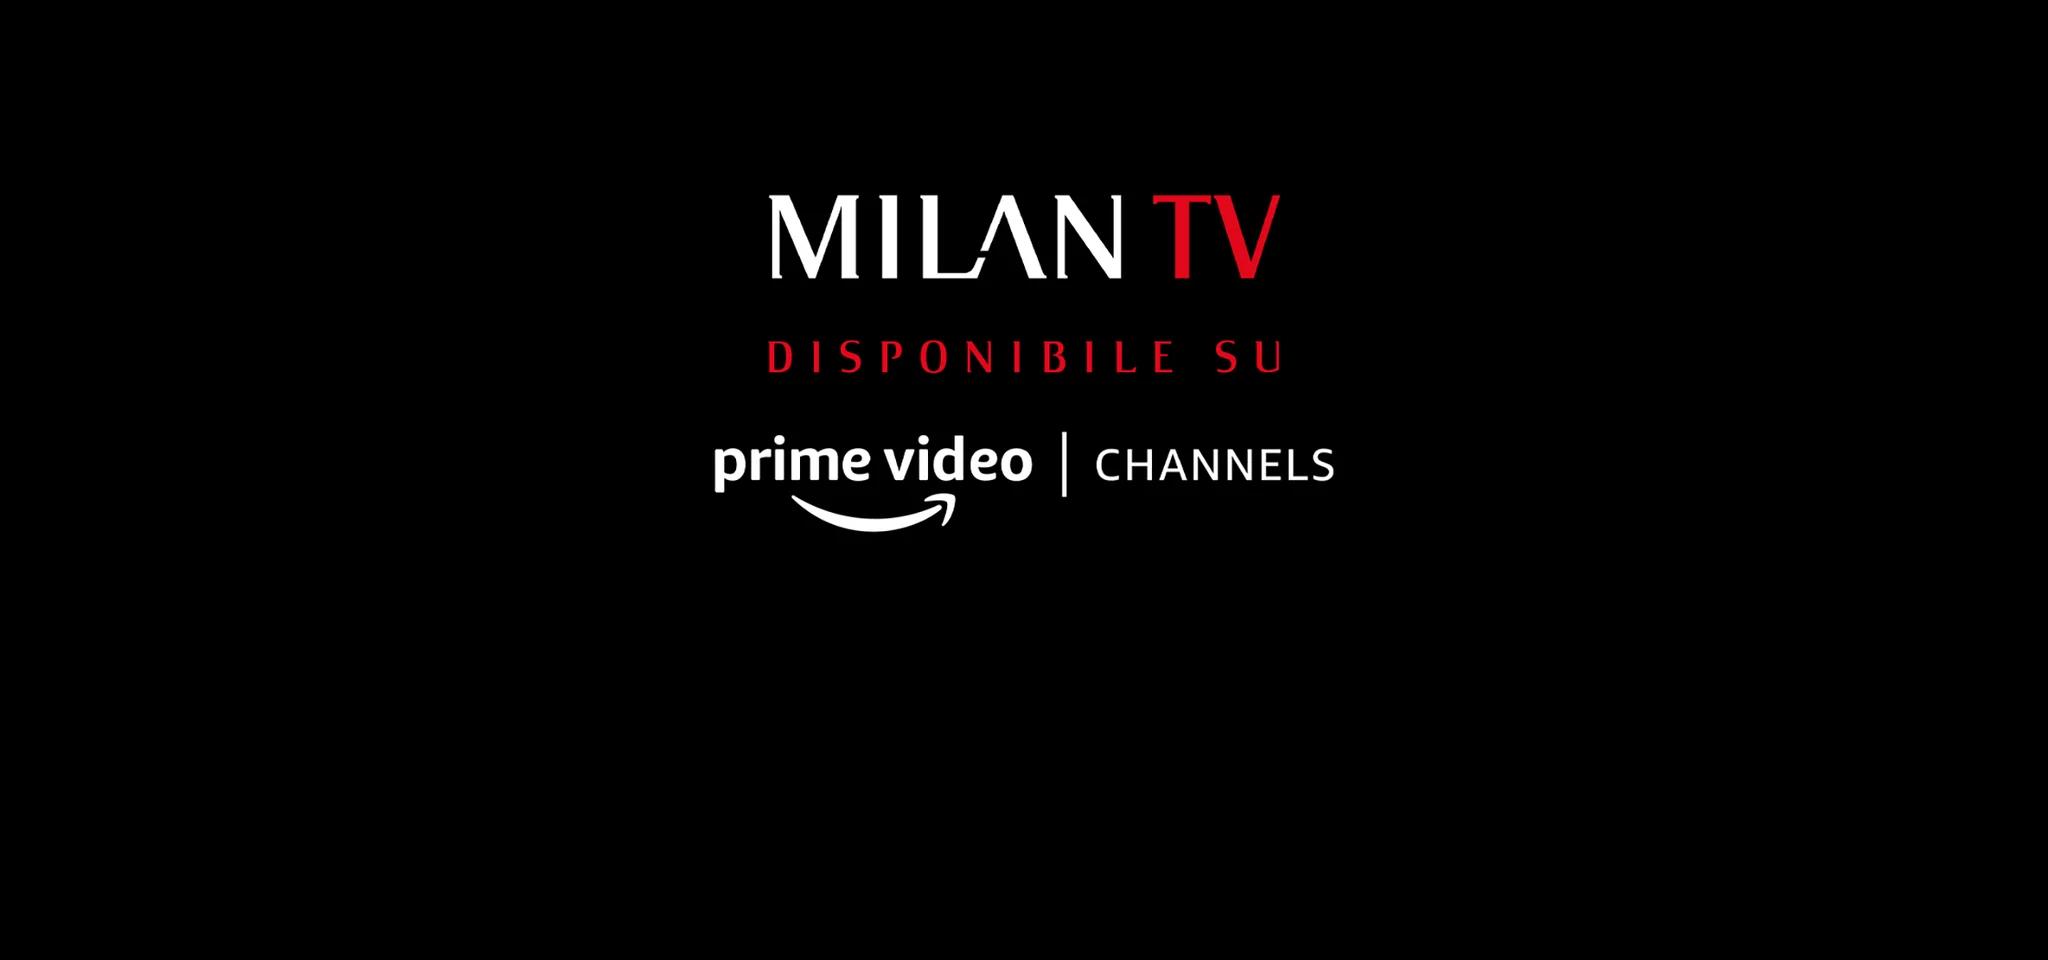 Milan Tv sbarca su Amazon Prime Video Channels